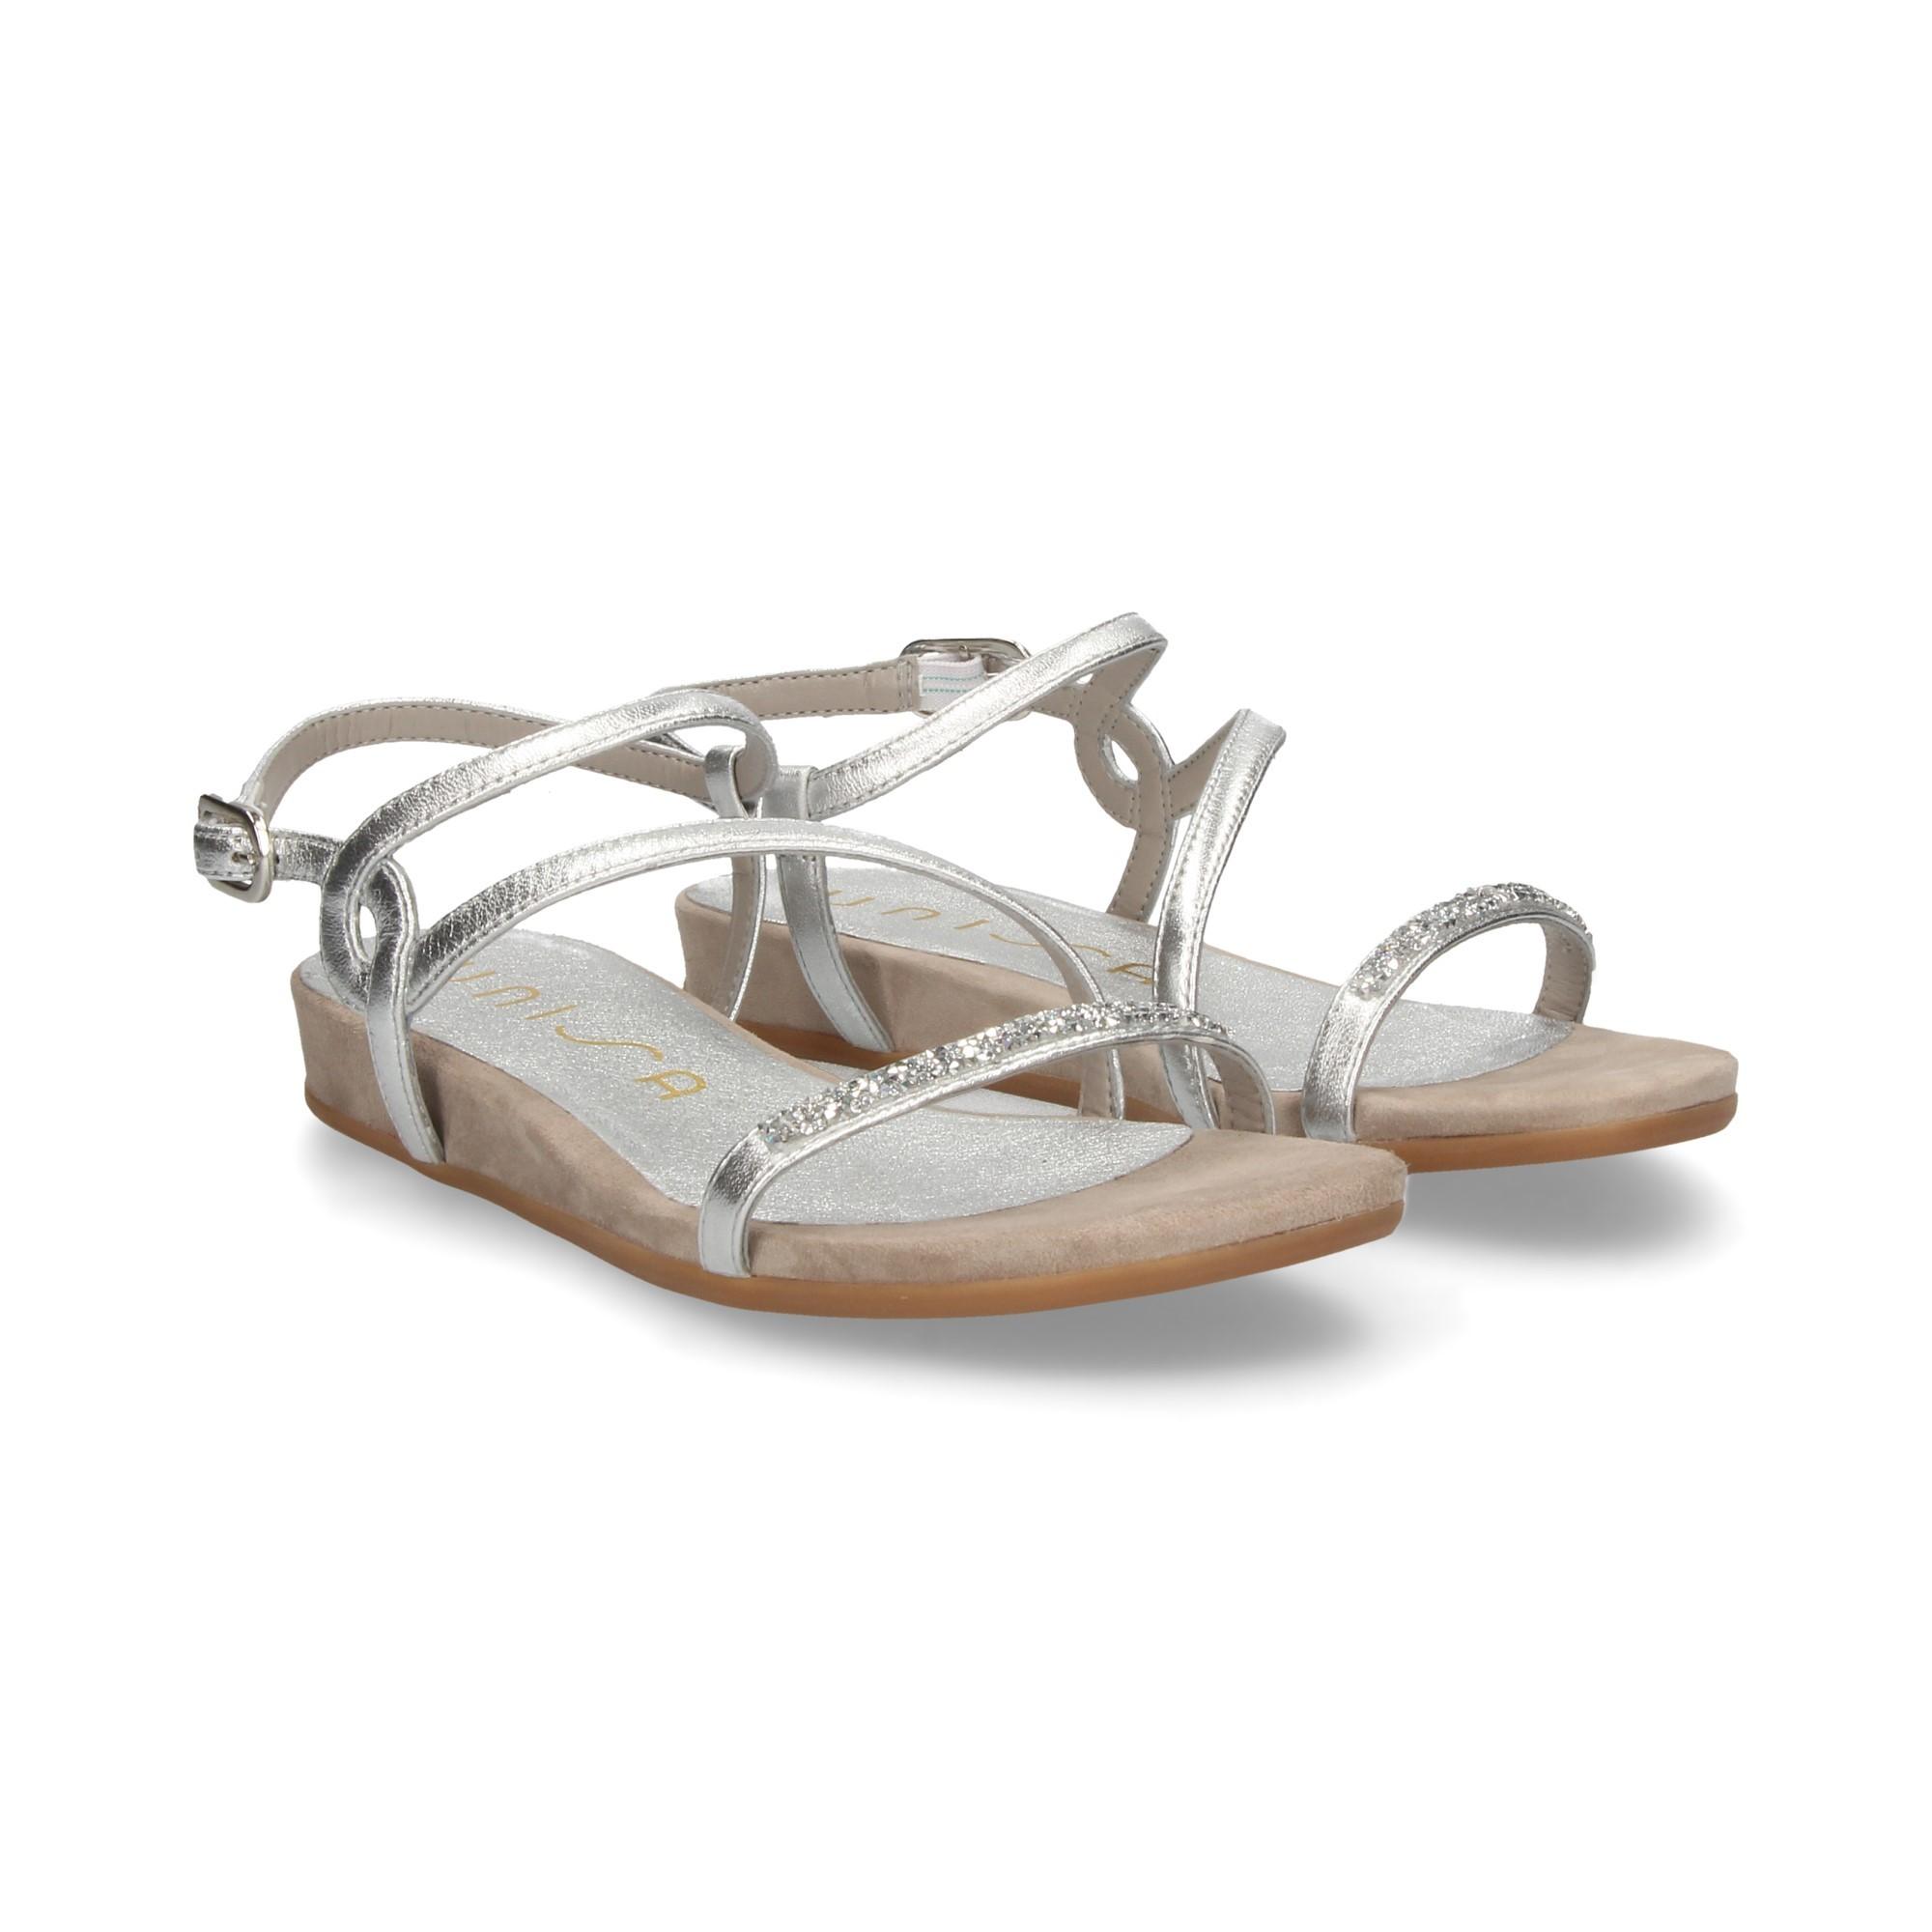 UNISA Flache Sandalen für Damen ANGOLA_LMT SILVER